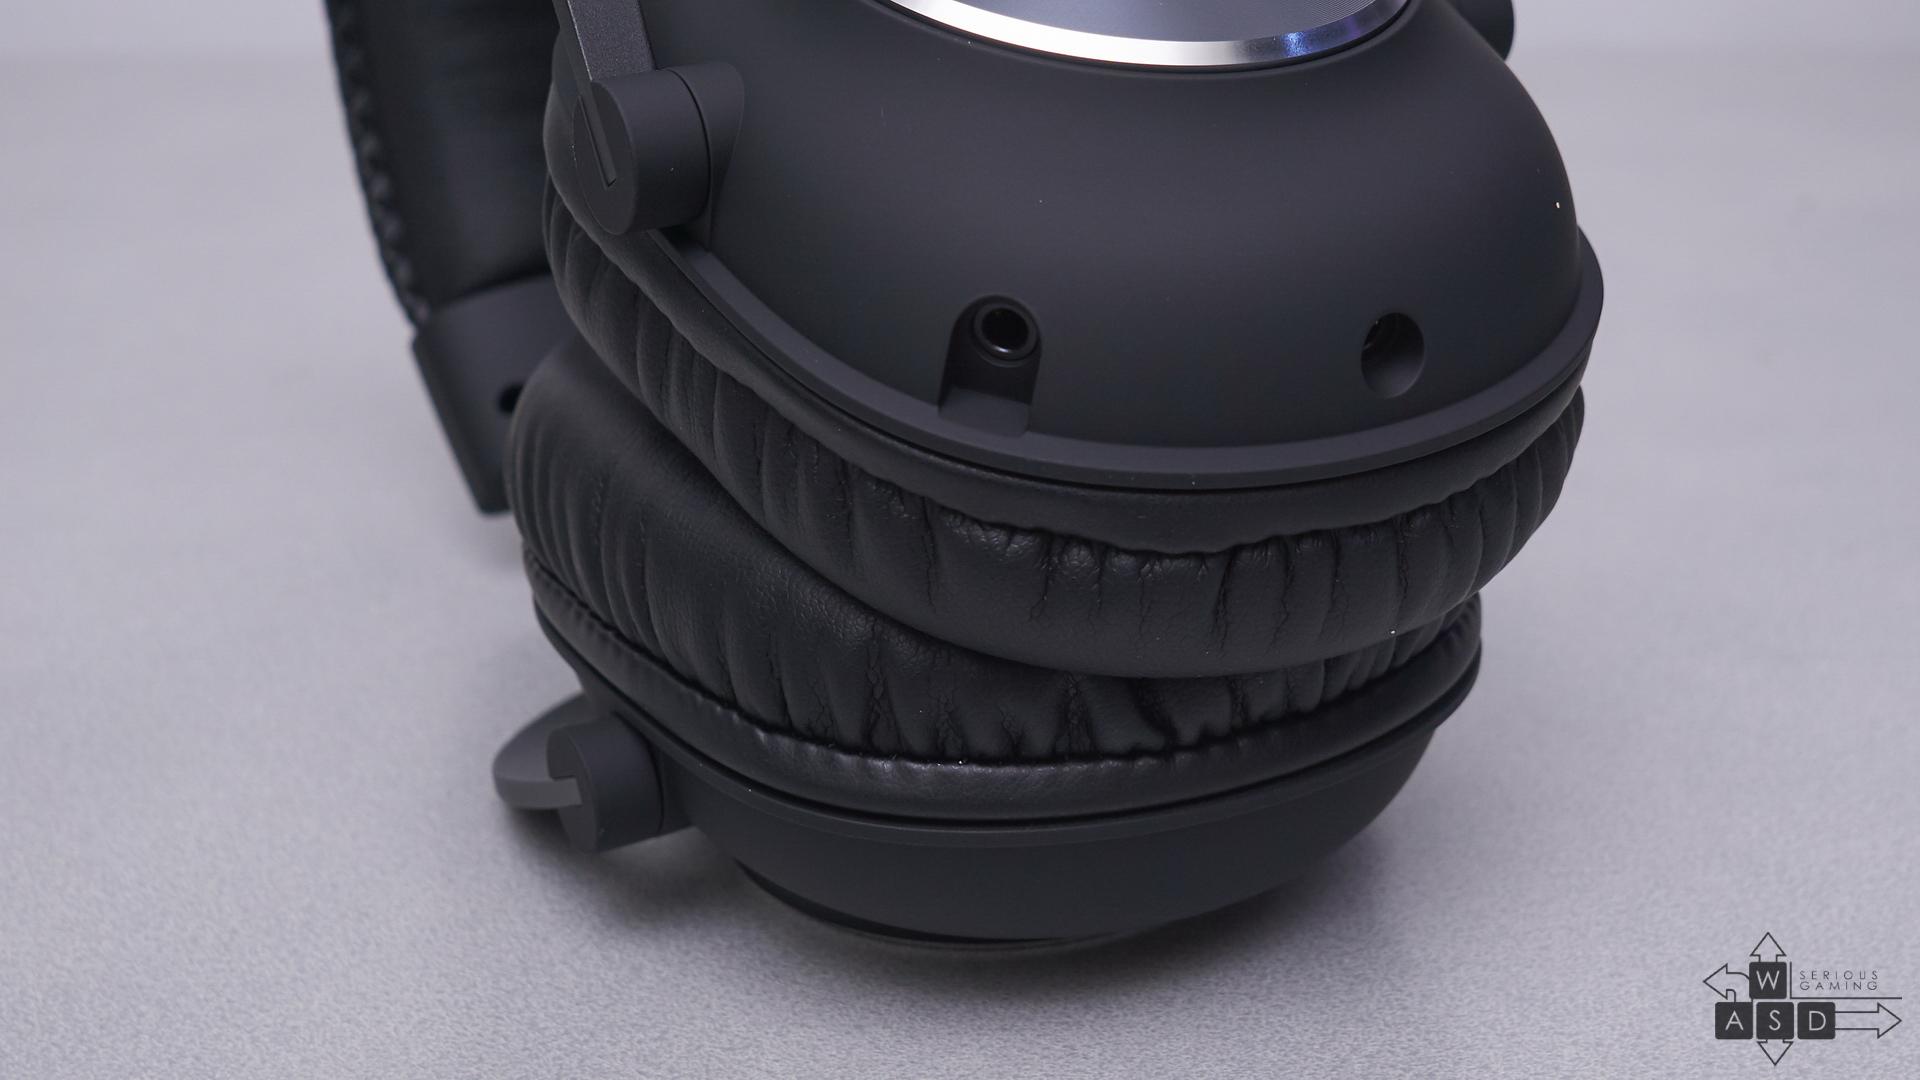 Logitech G Pro X review | WASD